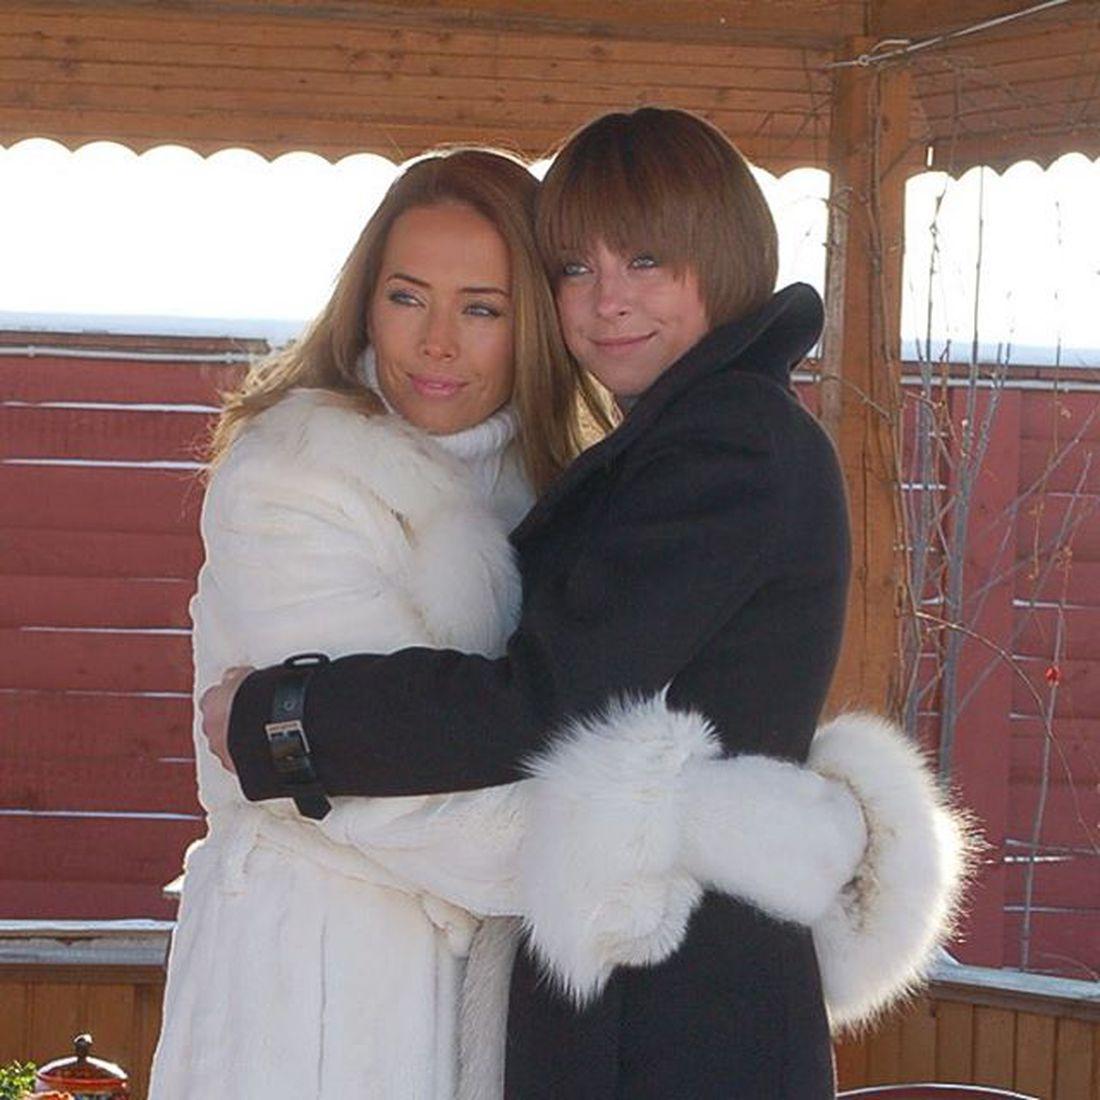 Сестра с мужем фото 21 фотография